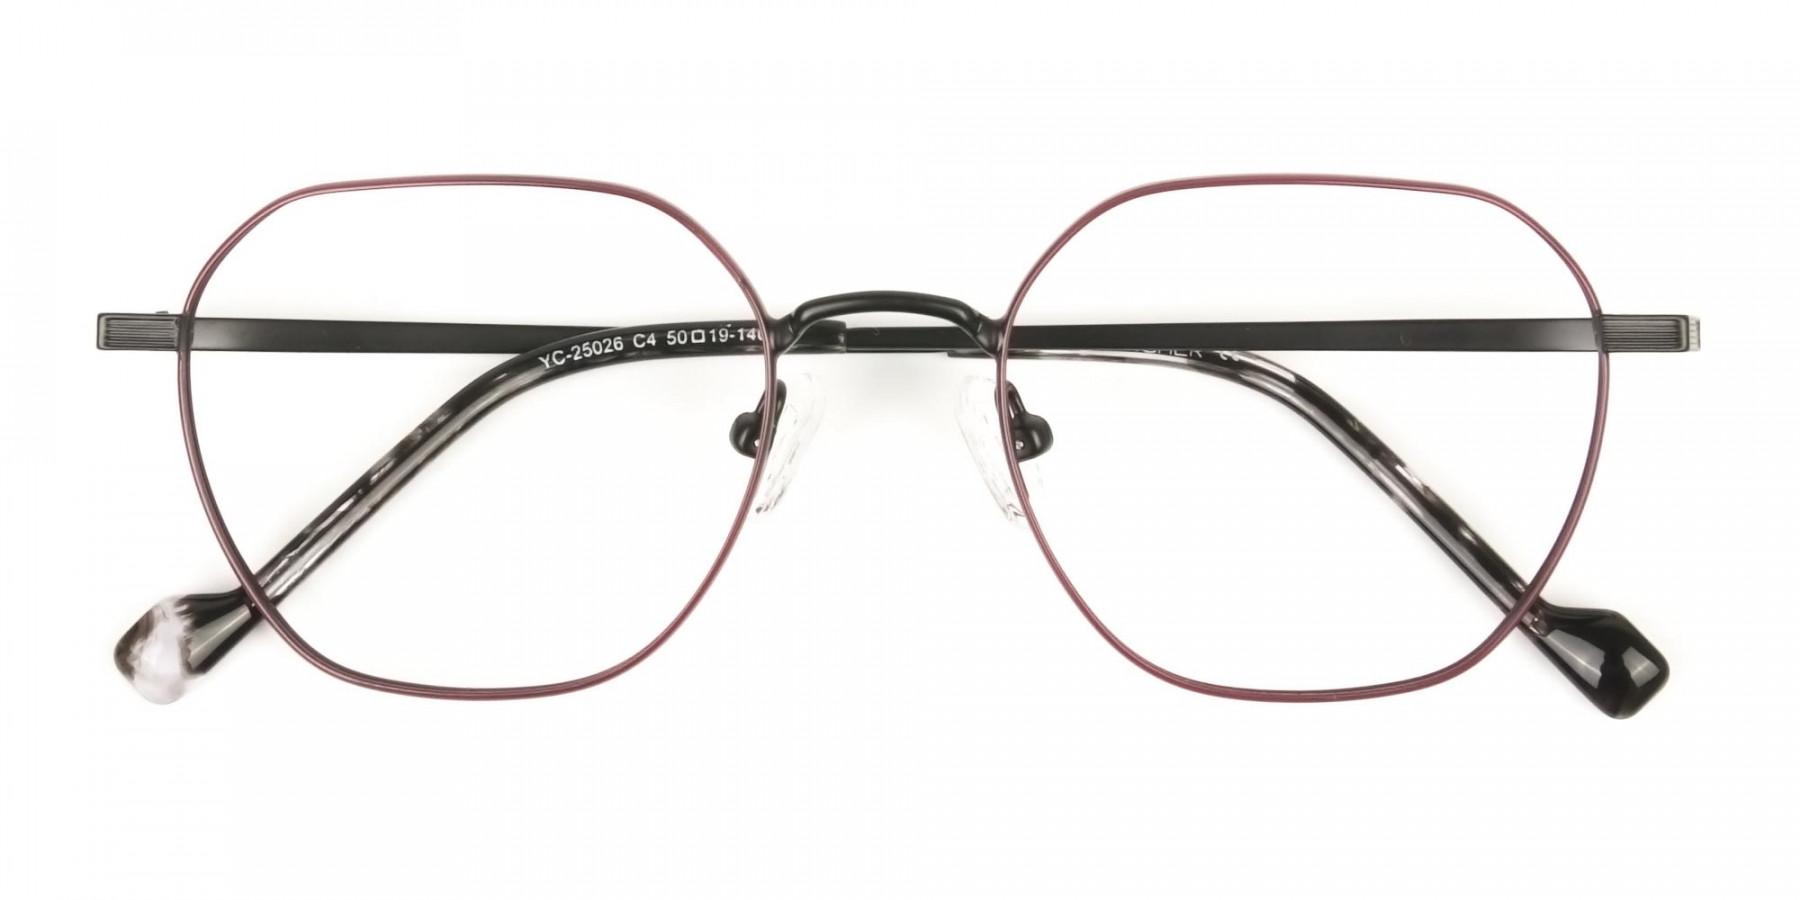 Black Red Geometric Glasses in Hexagon Shape - 1